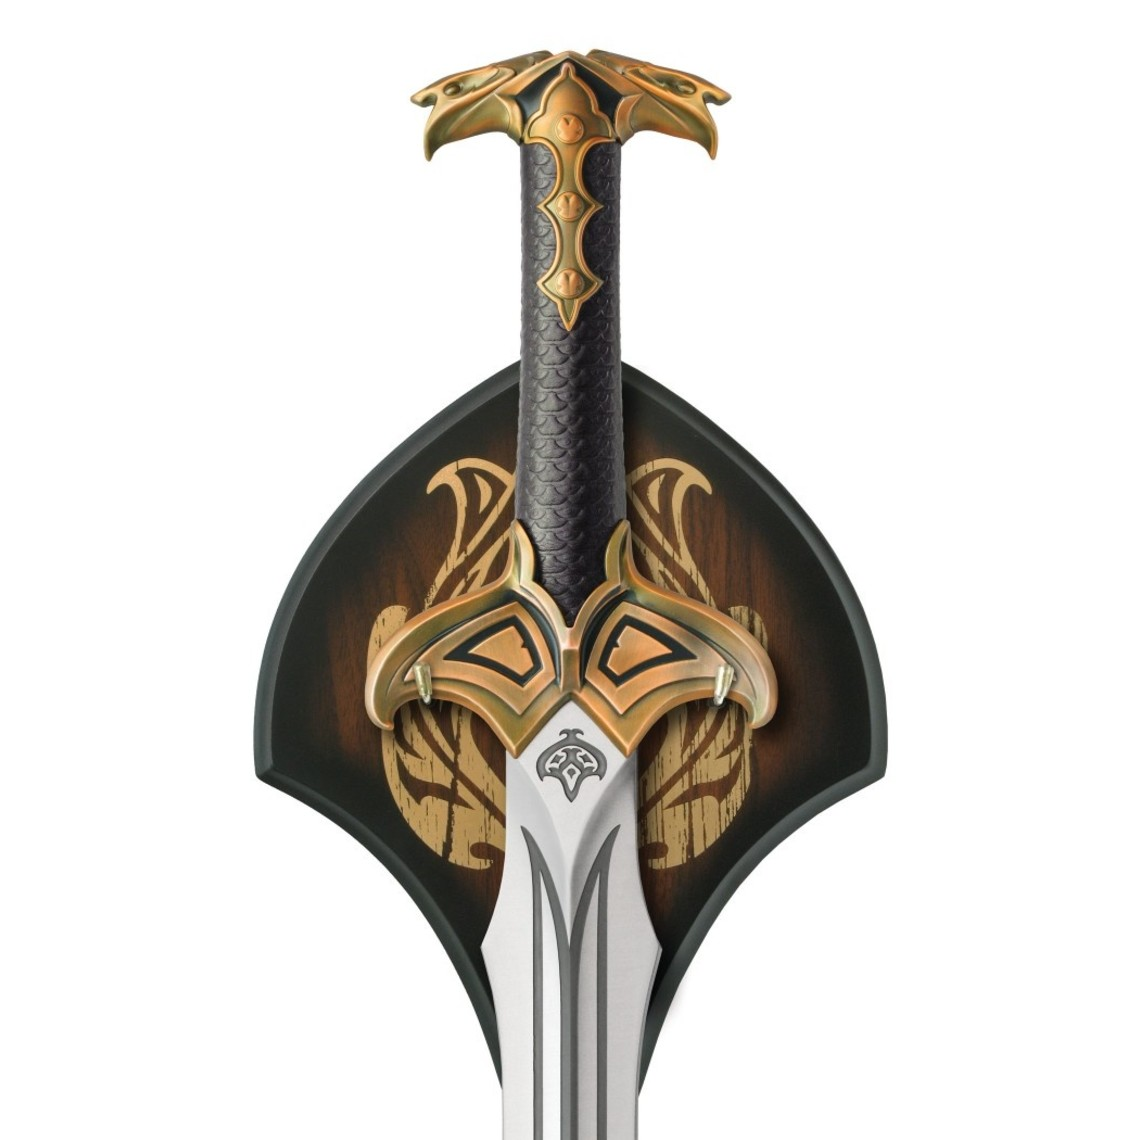 United Cutlery Hobbit - zwaard van Bard the Bowman